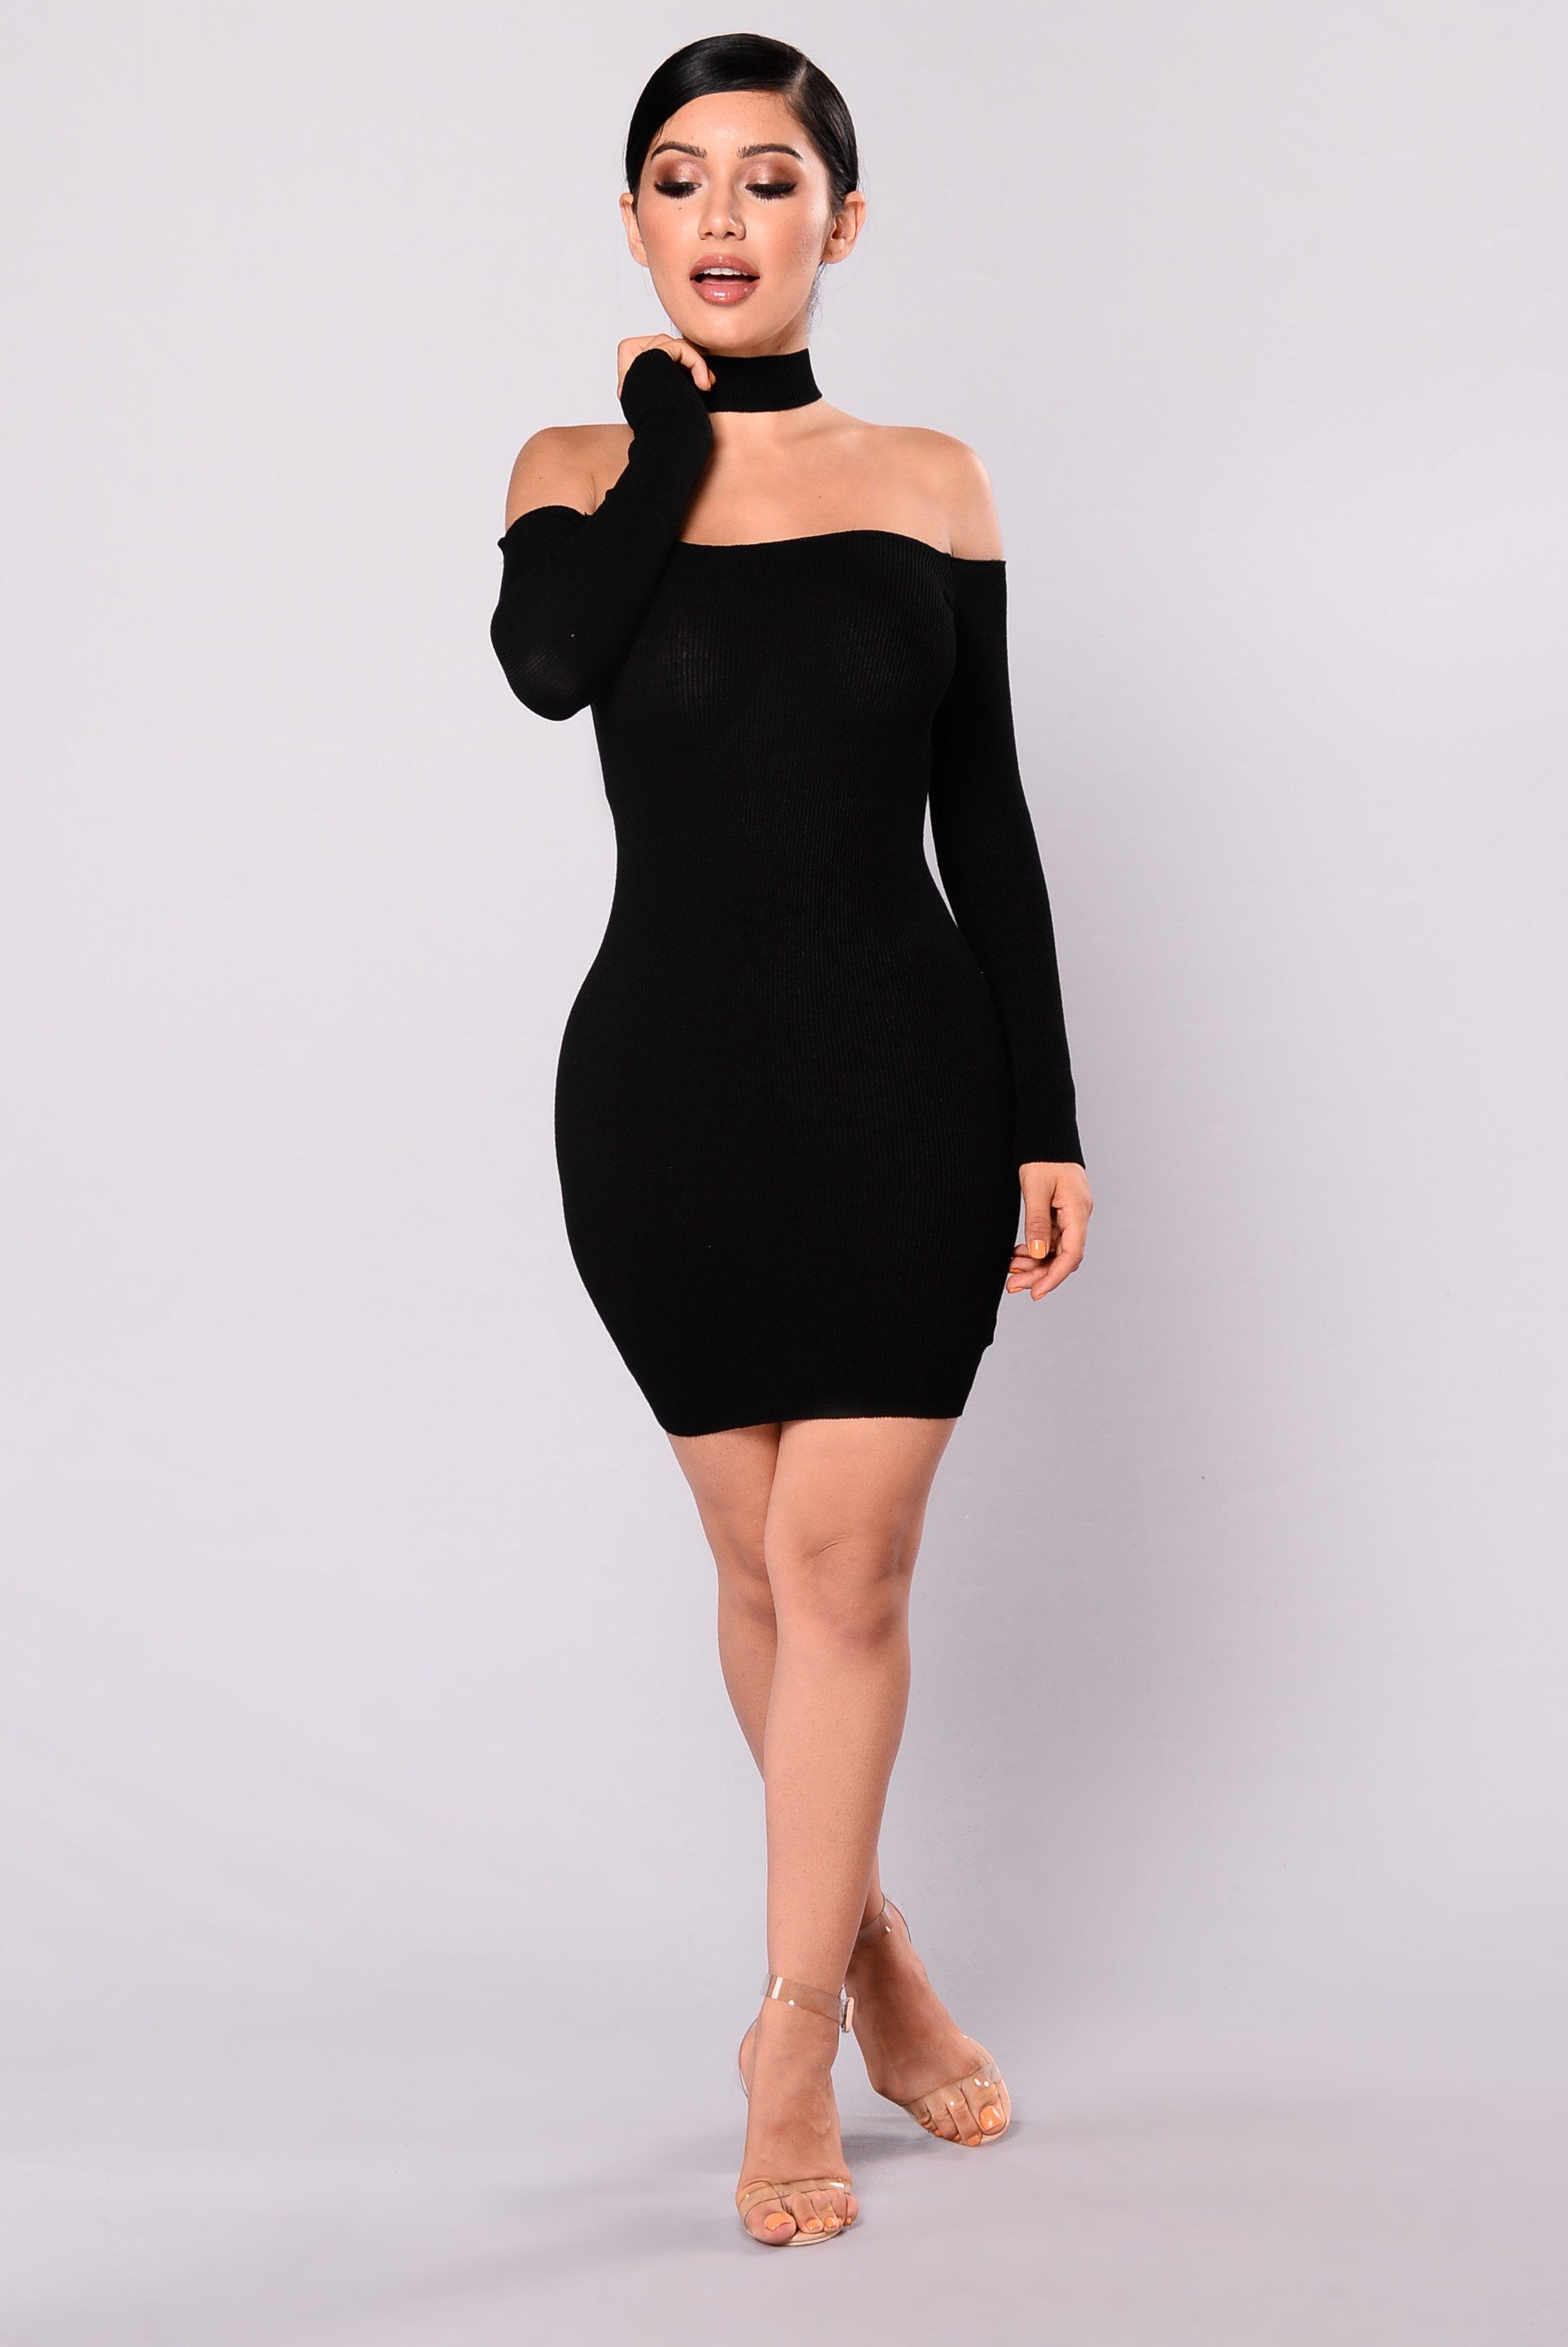 485416a6a04 Image result for fashion nova black short dress